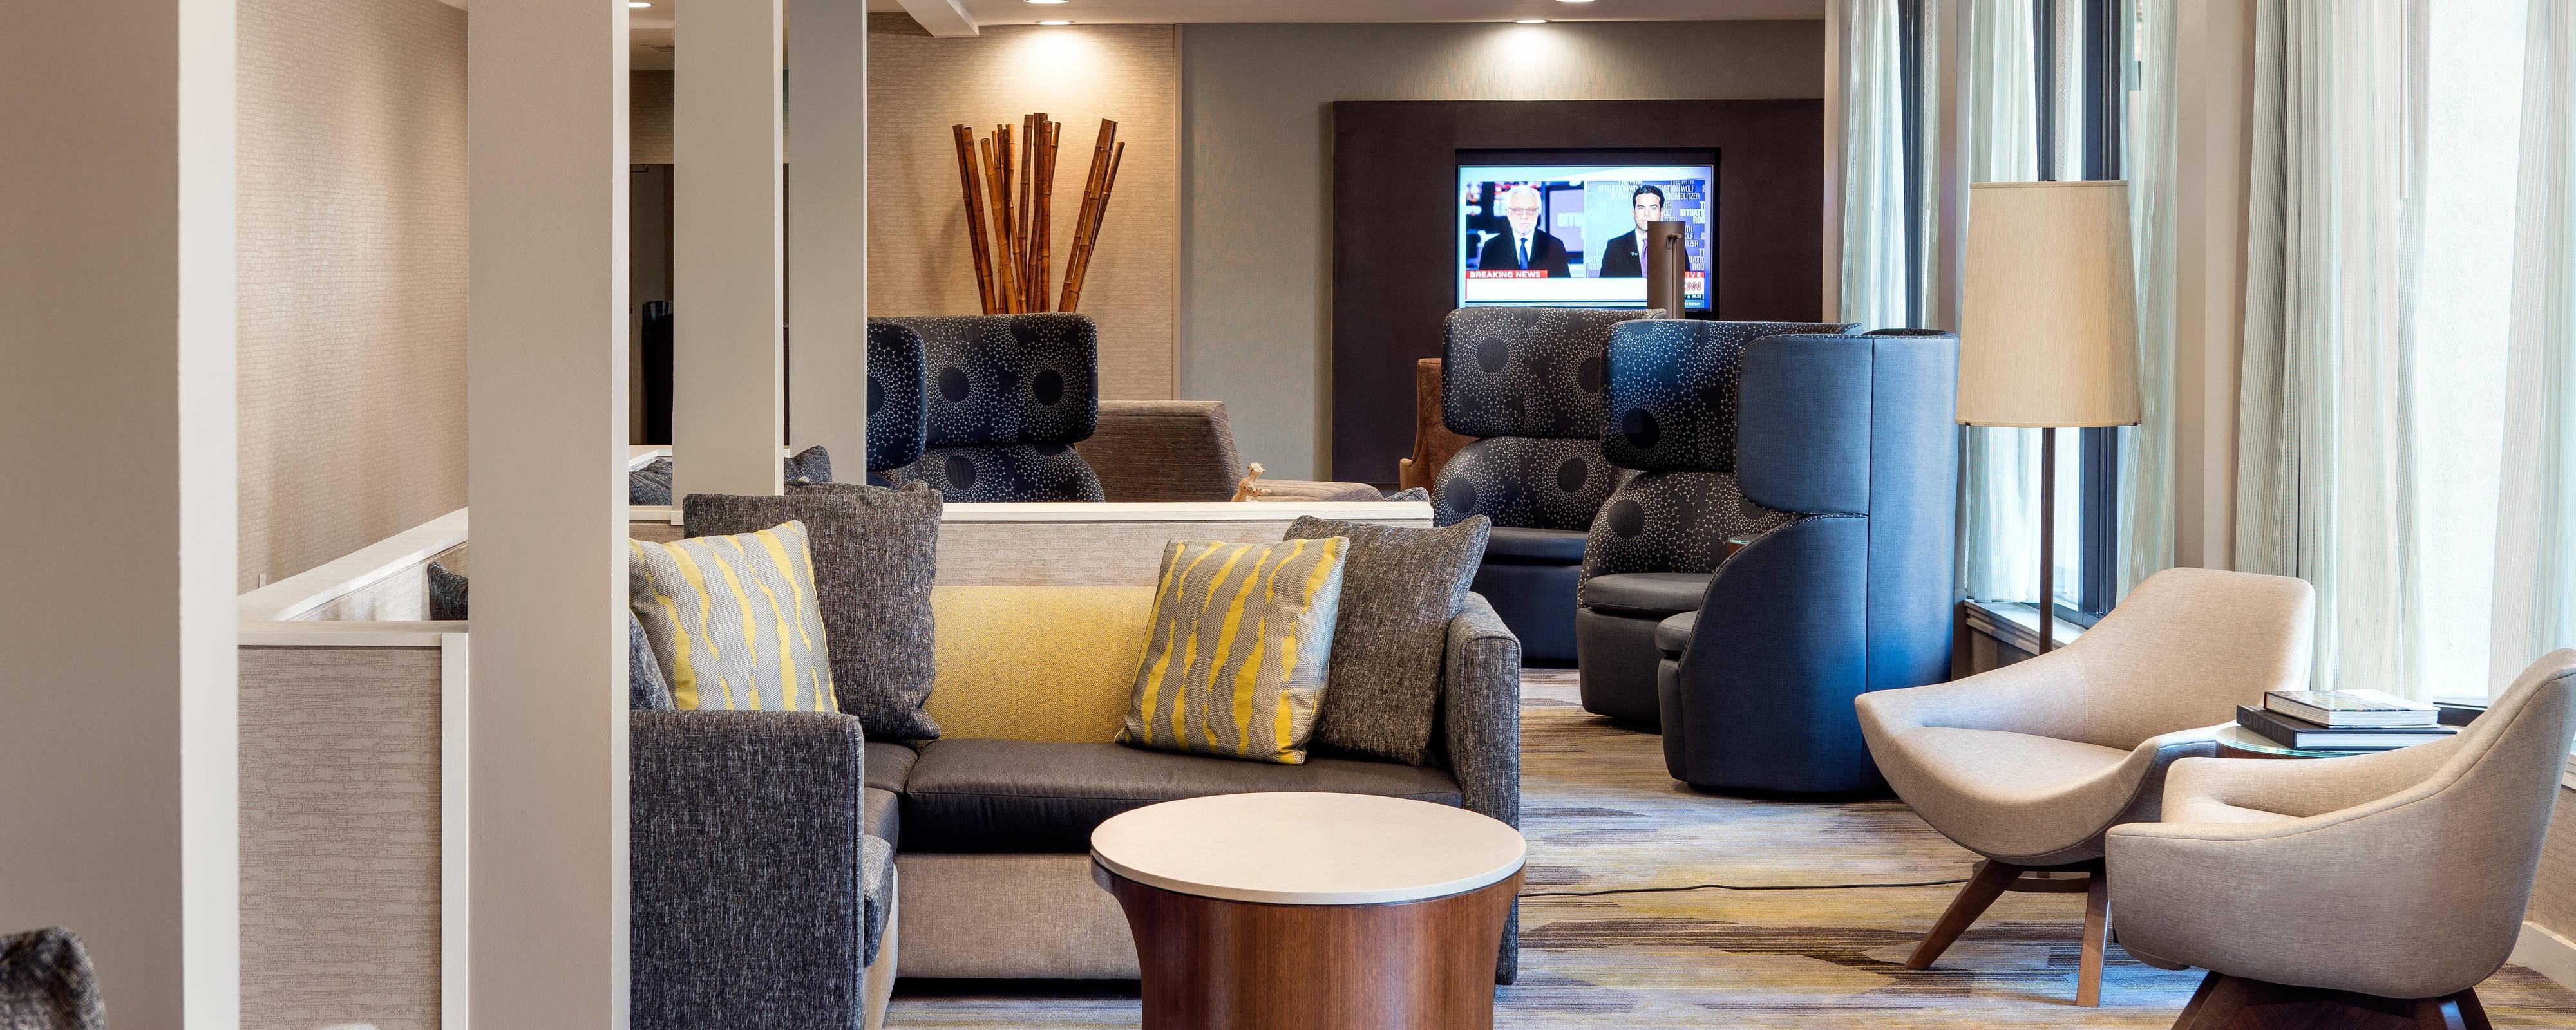 Irvine CA Hotel Near Airport